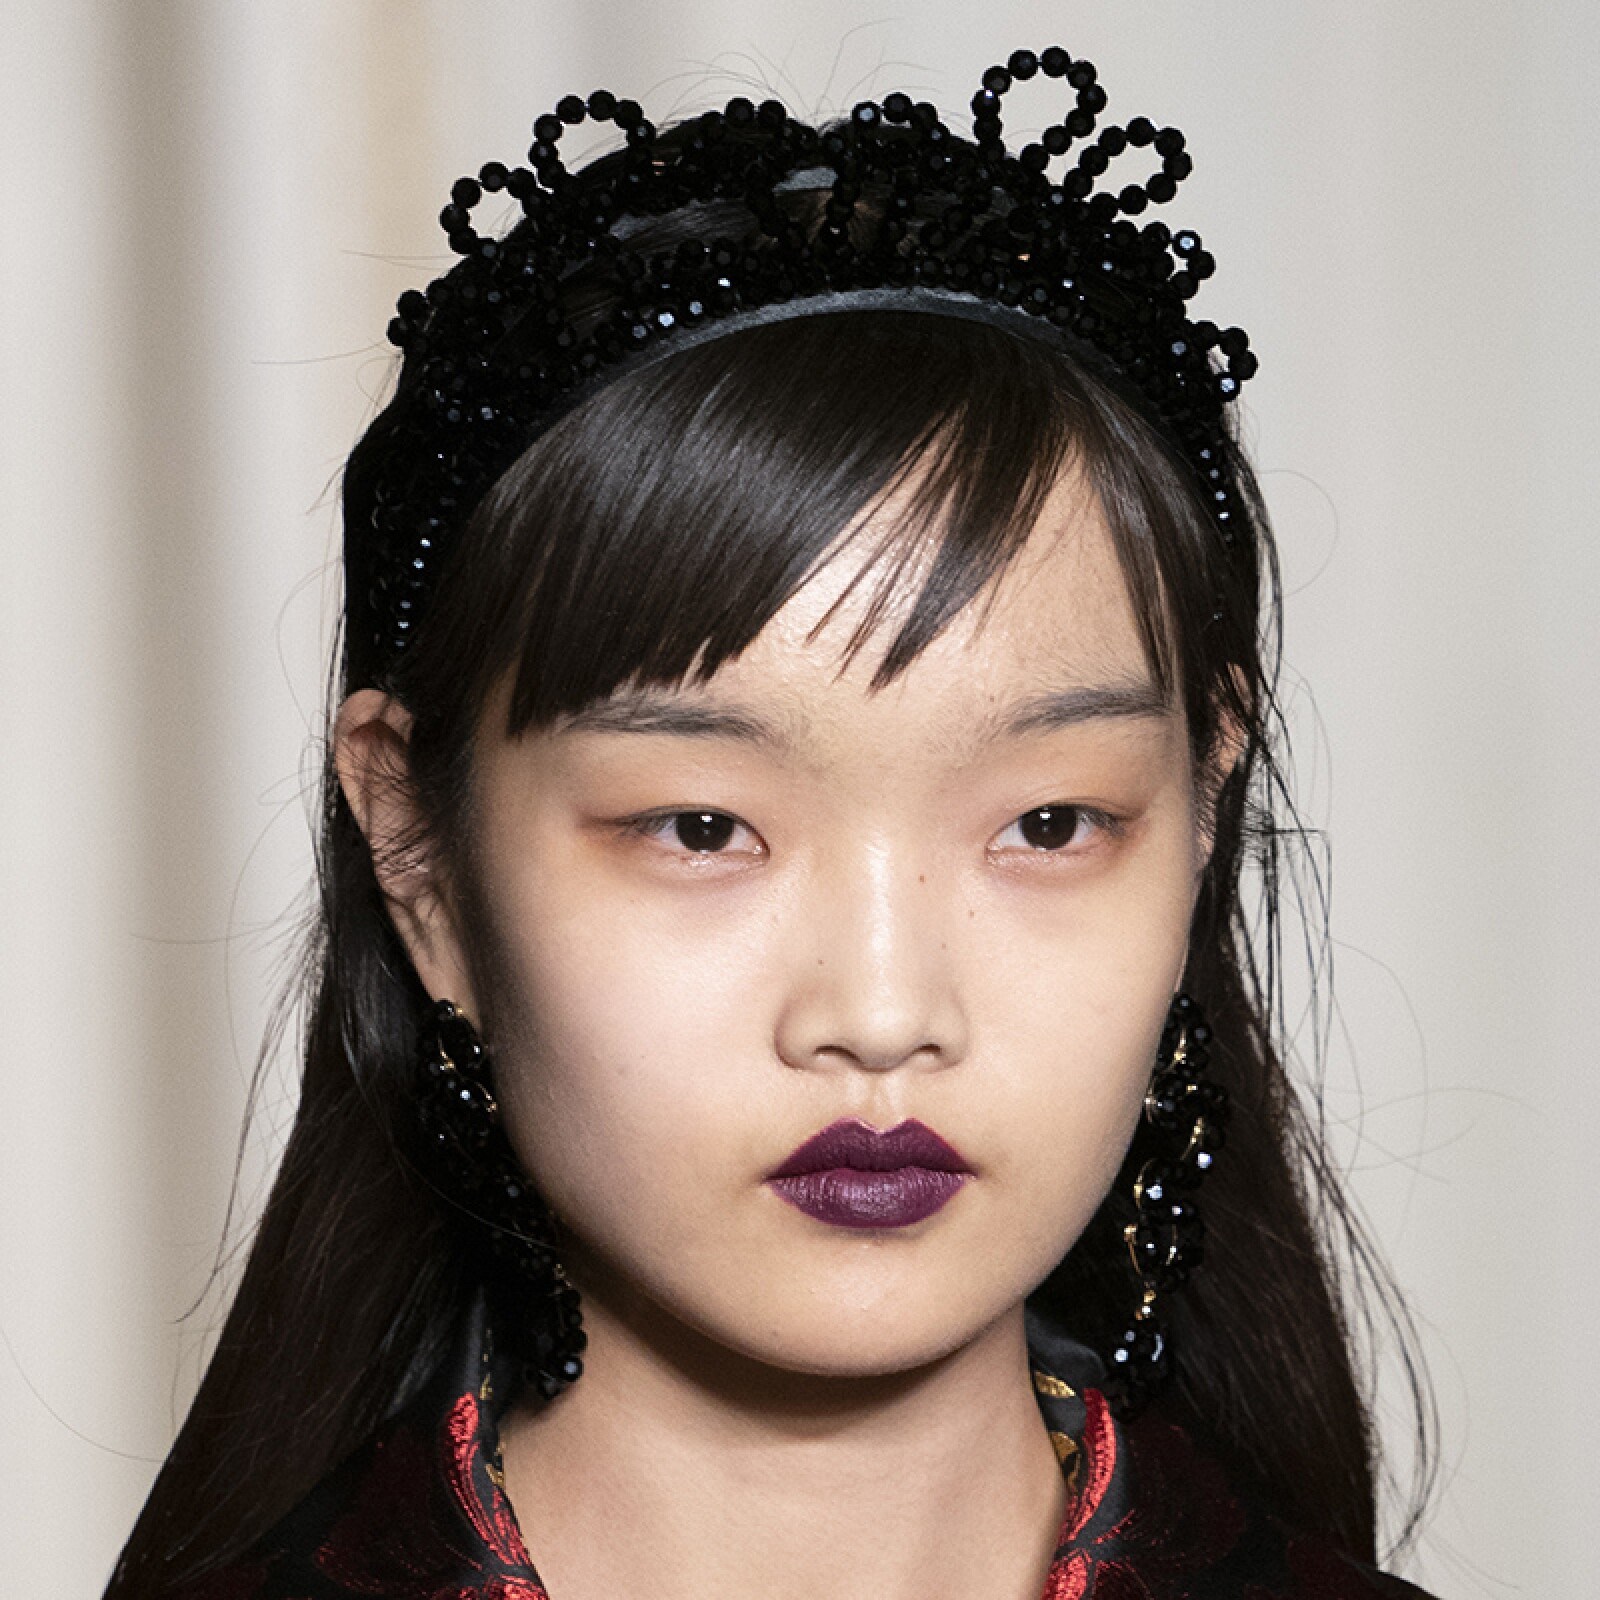 lfw-fashion-week-runway-beauty-looks-maquillaje-simonerocha